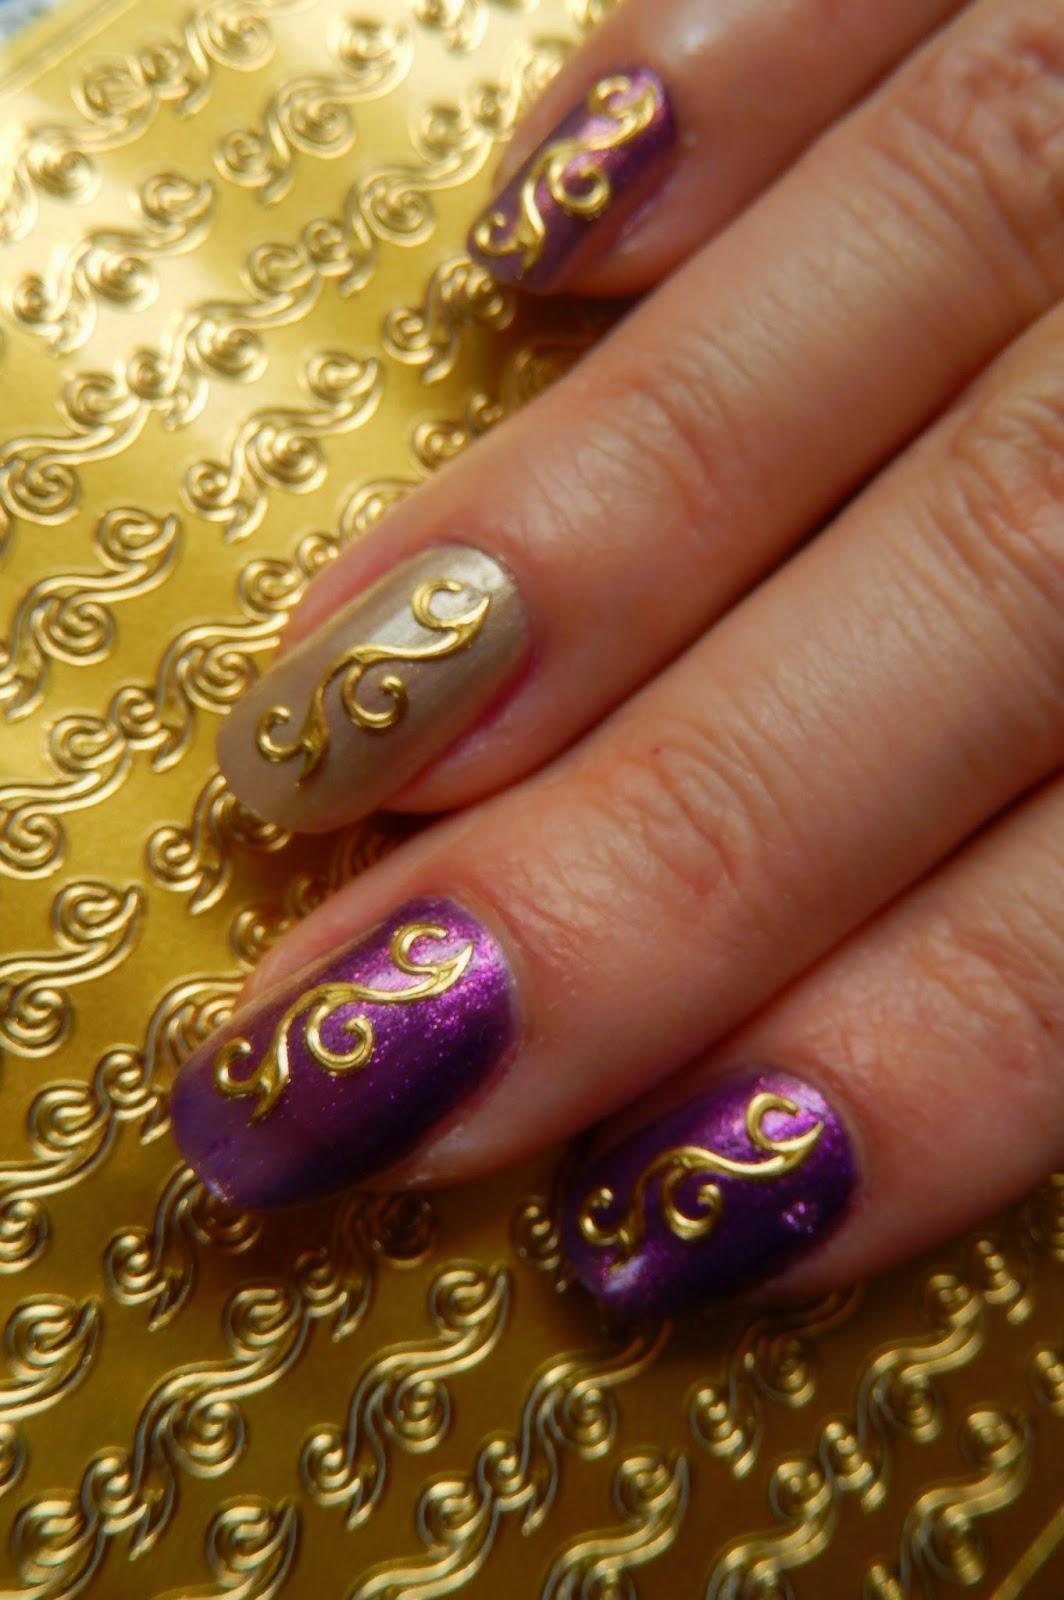 http://www.bornprettystore.com/makeup-beauty-c-270.html